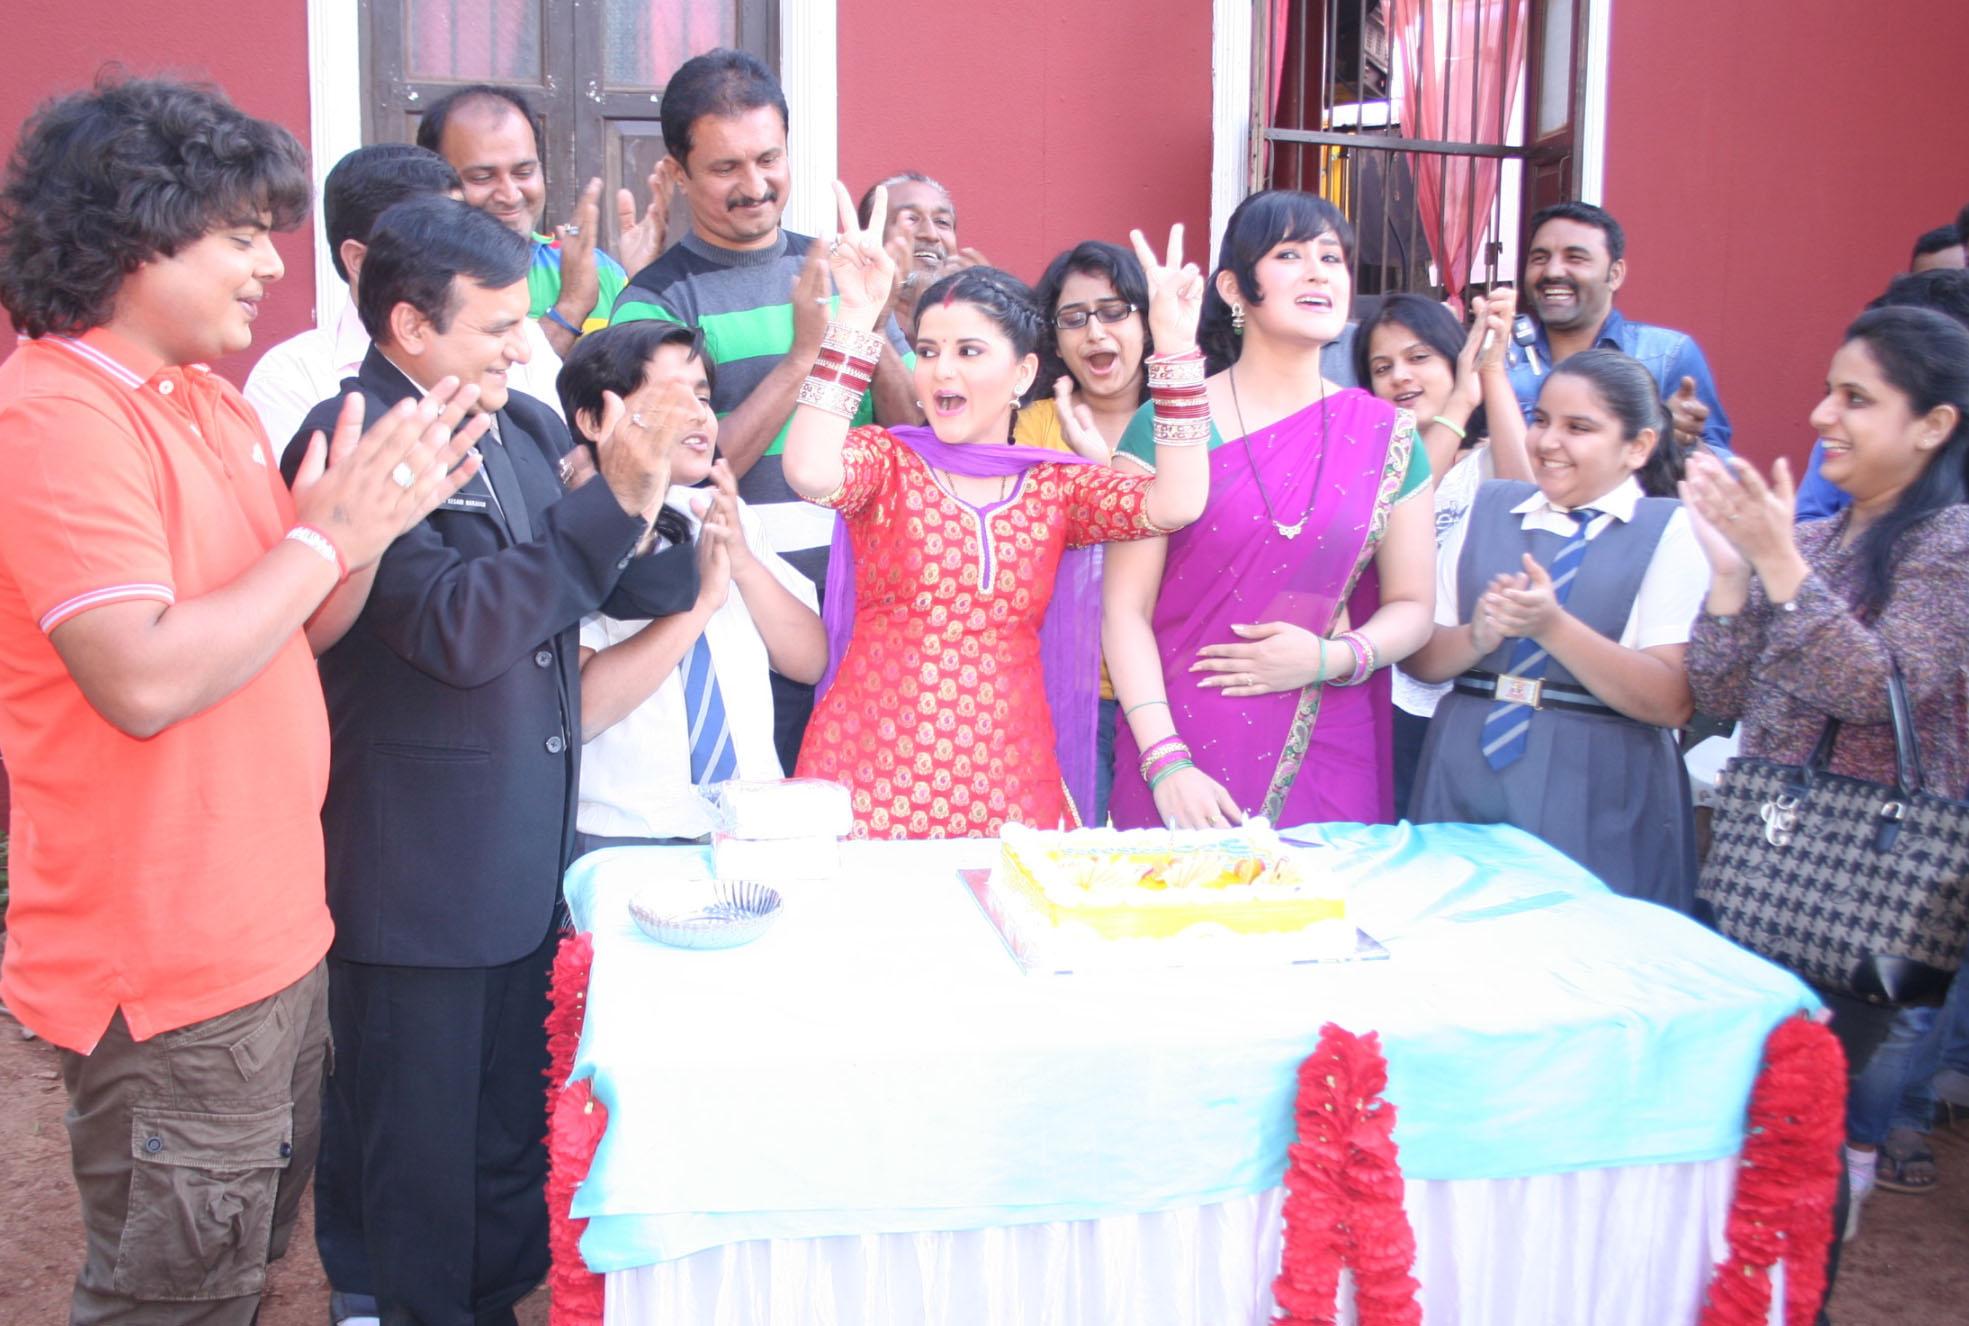 Chidiya Ghar celebrates completion of 800 Episodes with Paresh Ganatra, Sumit Arora, Saaransh Verma, Aditi Sawan & Trishika Tripati